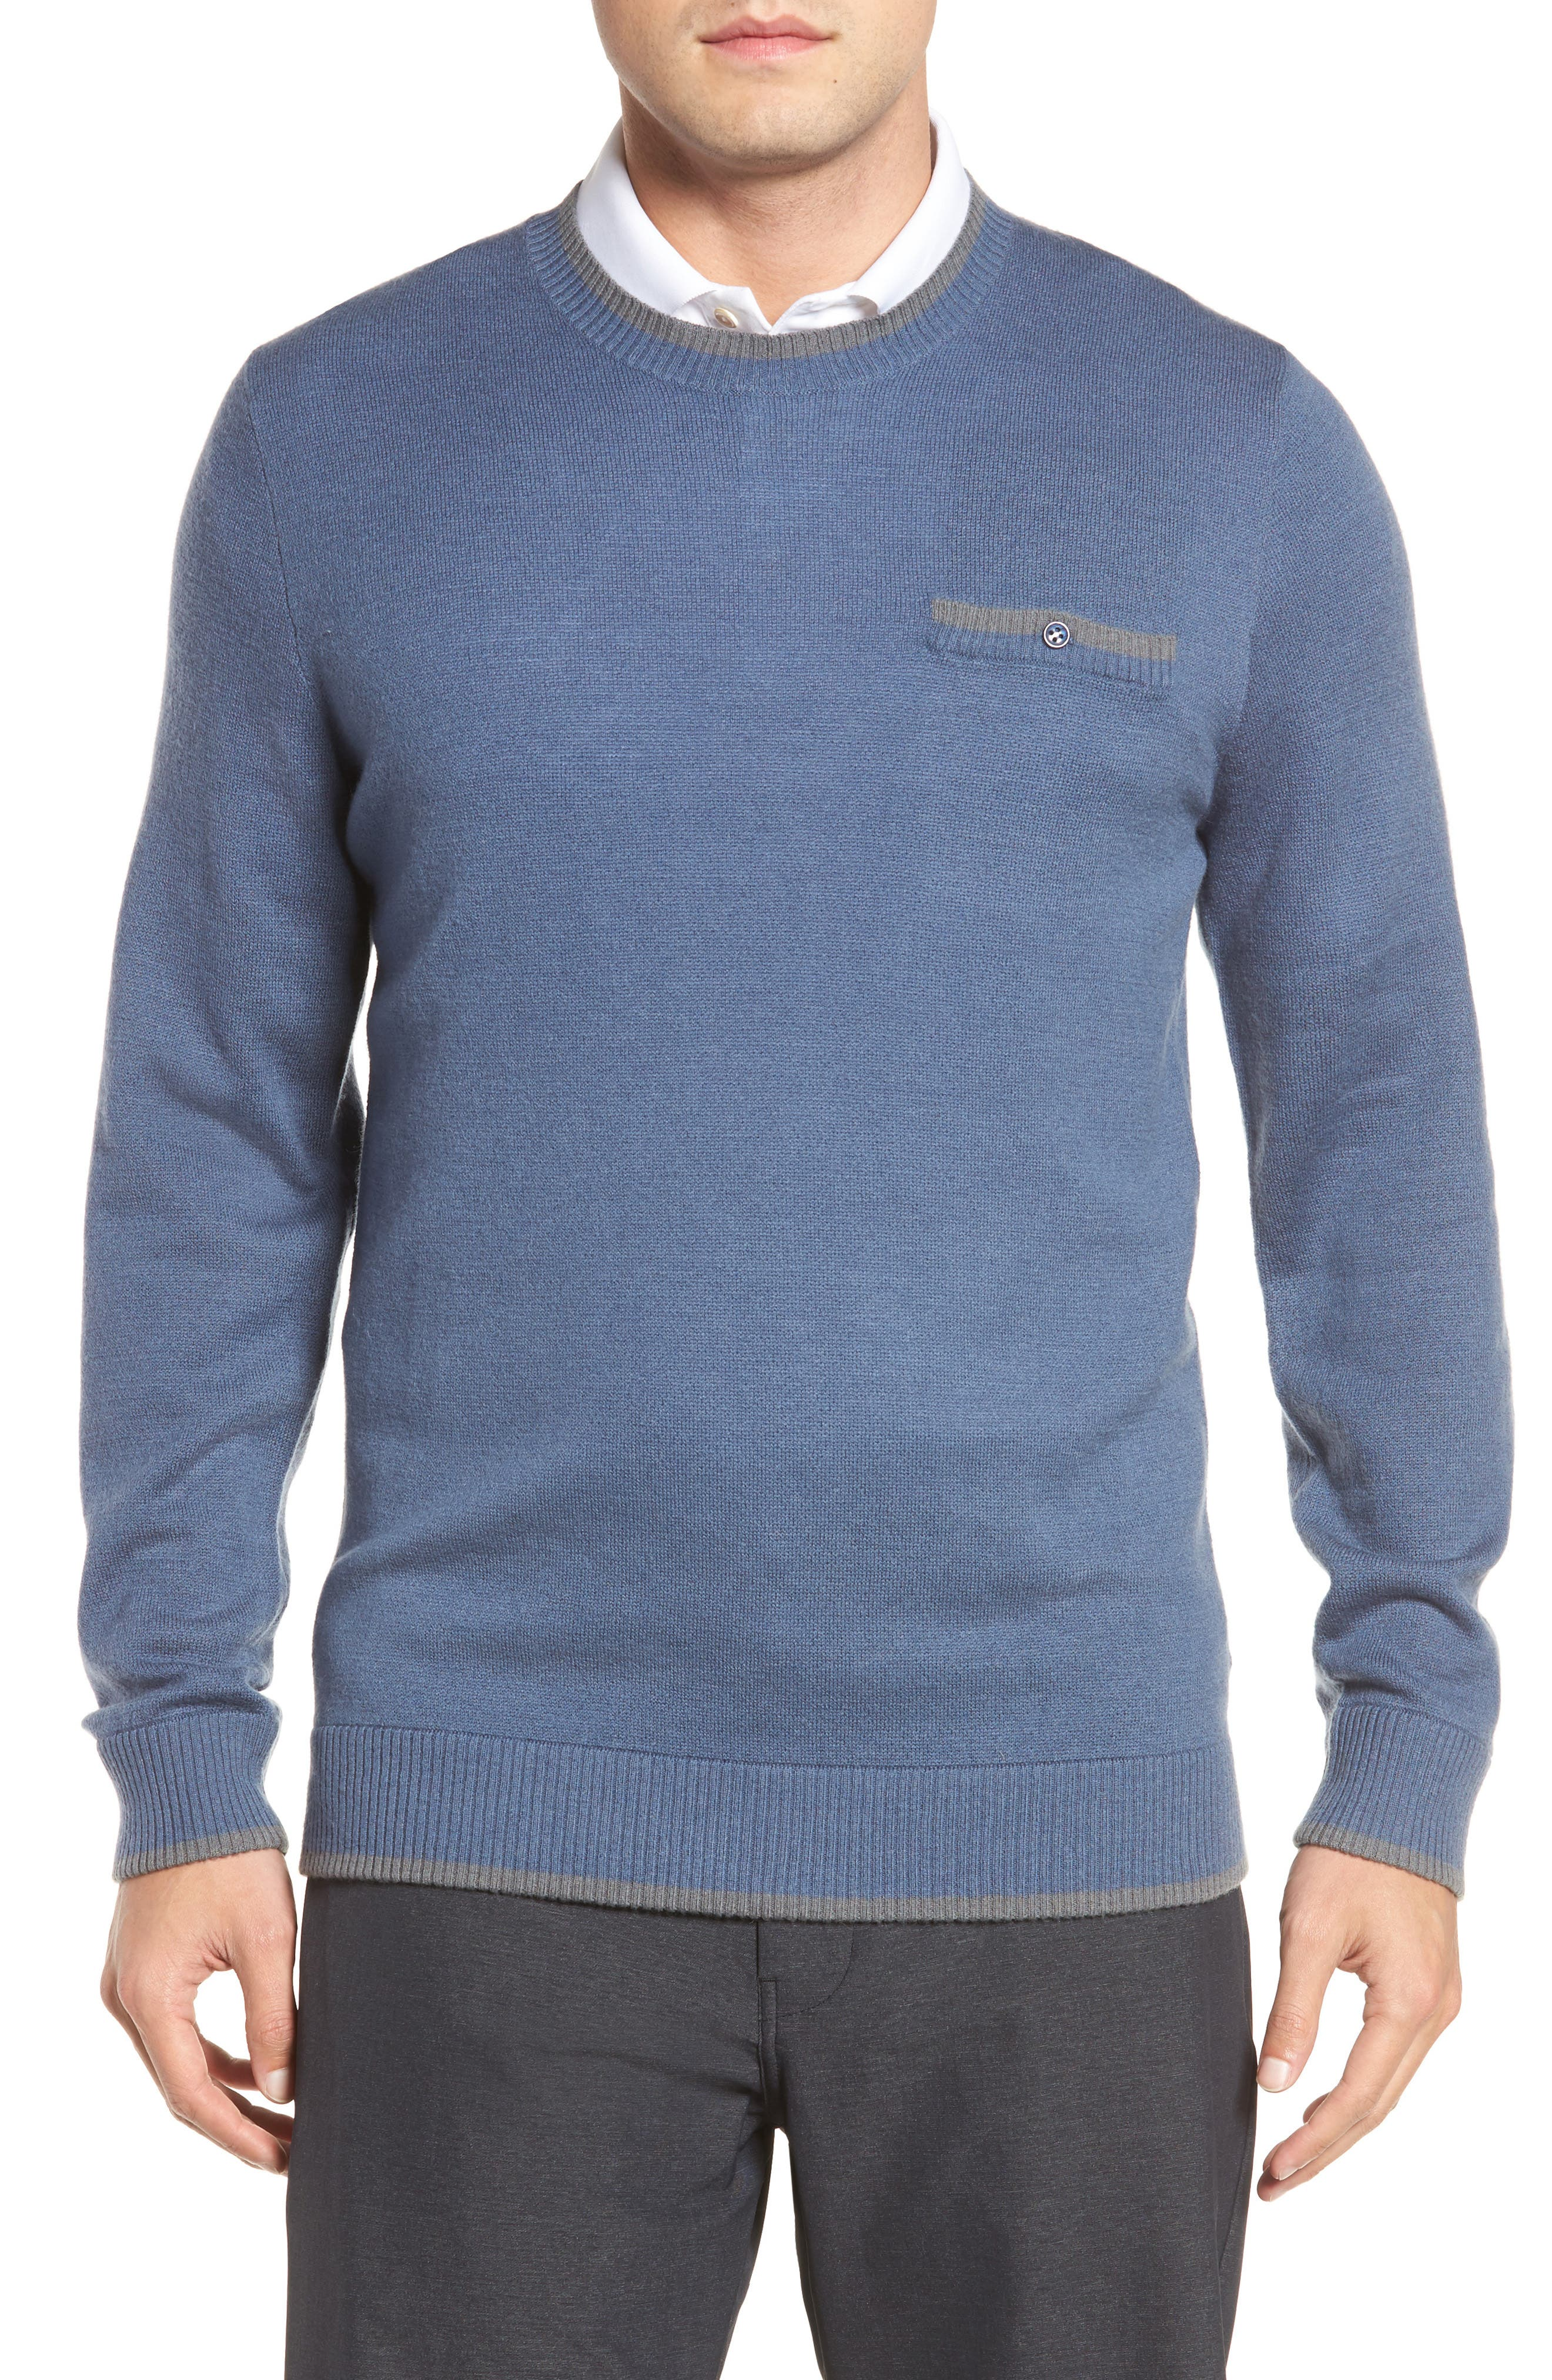 Paglia Wool Blend Sweater,                         Main,                         color, Vintage Indigo